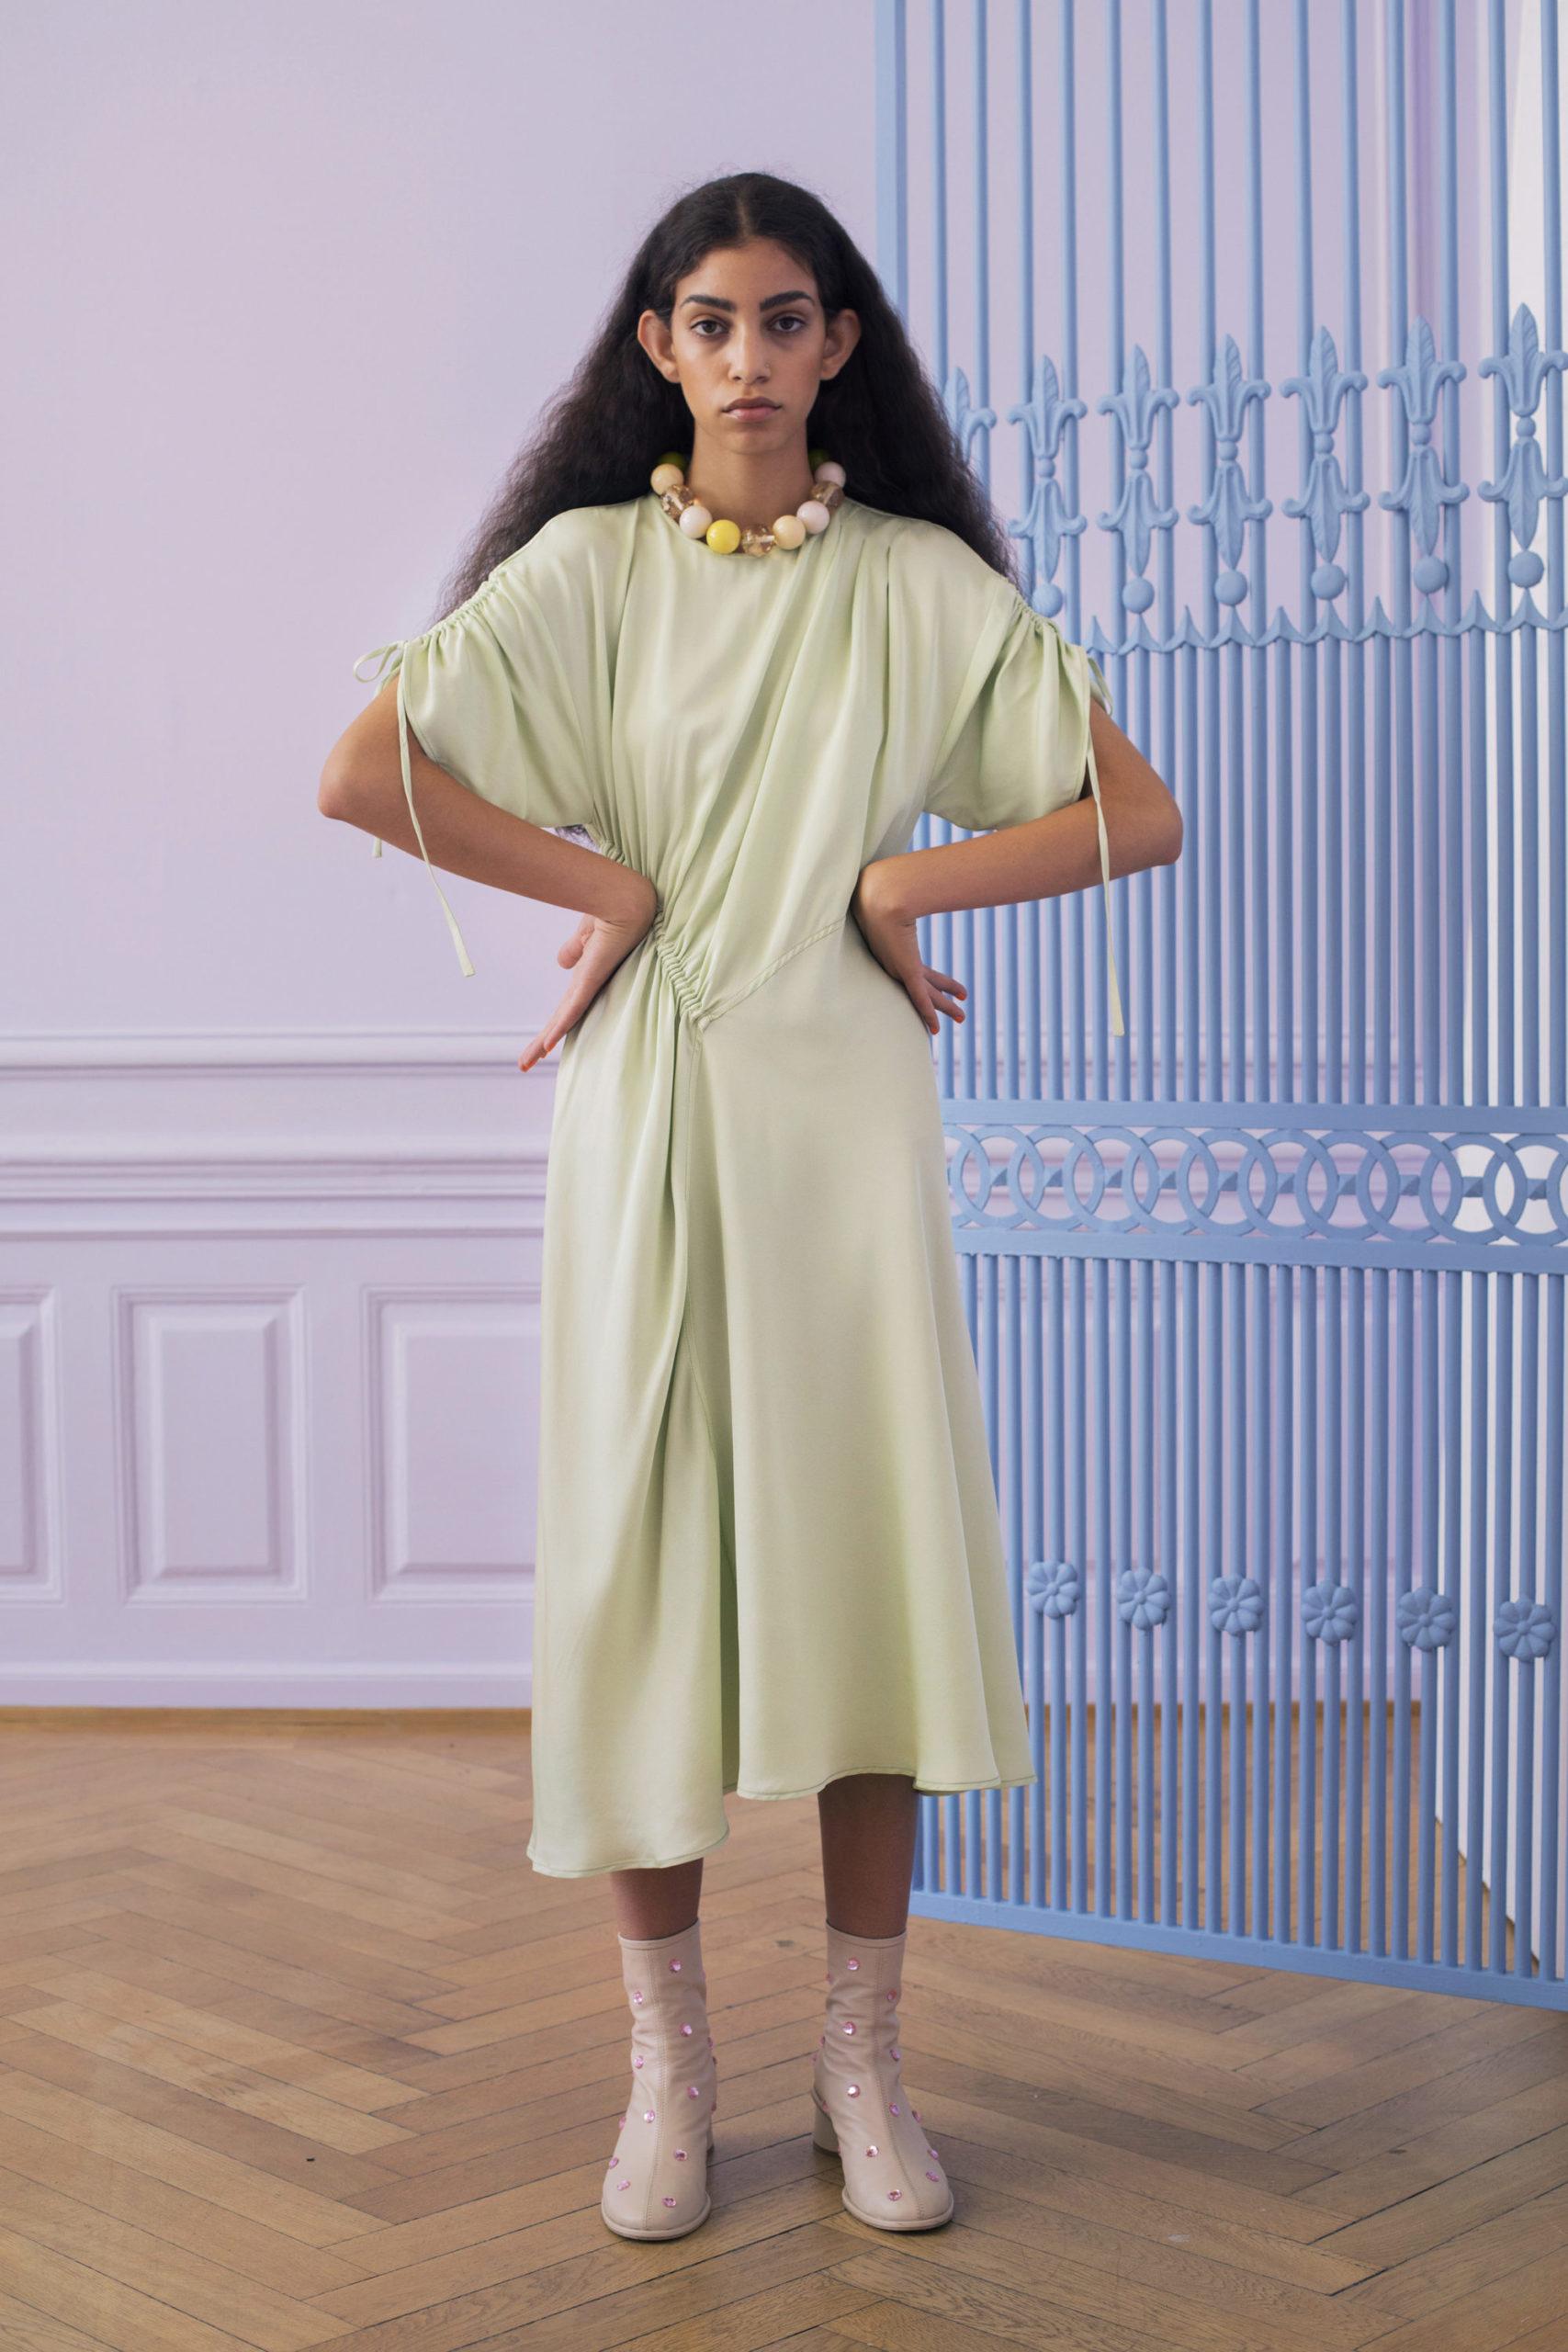 Ментоловый образ от Stine Goya Ready To Wear весна-лето 2021